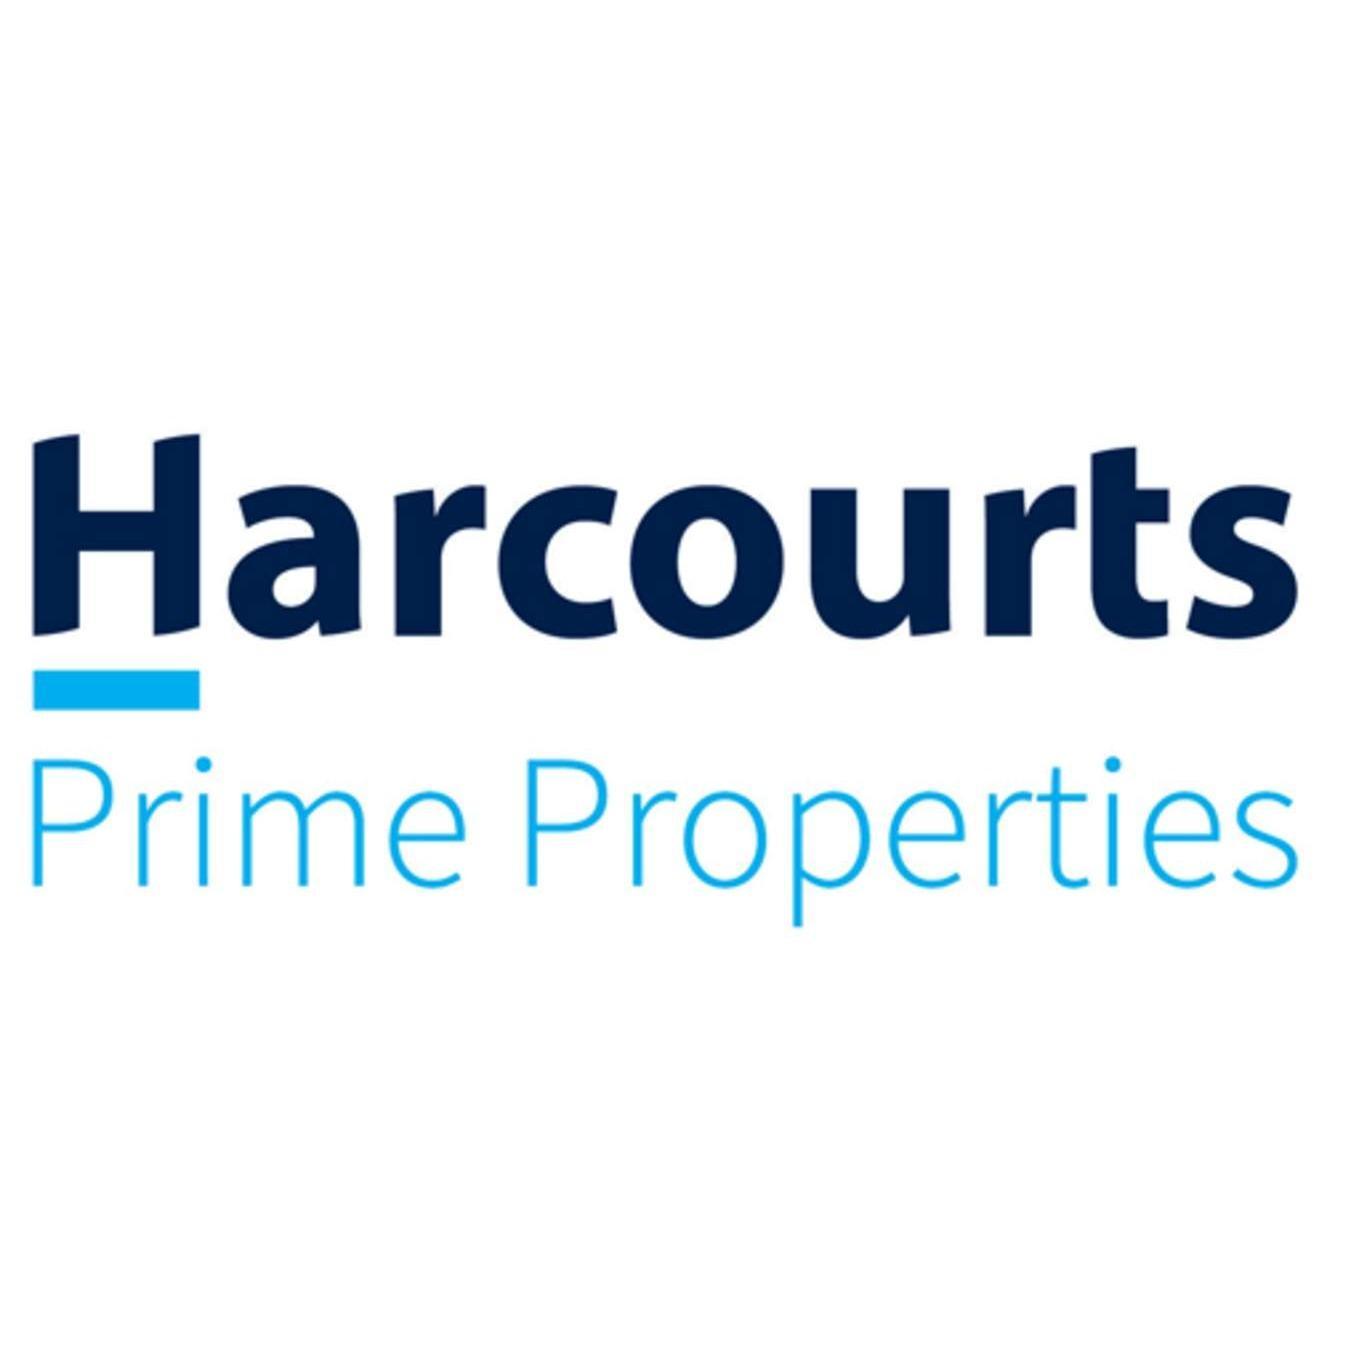 DaCosta Properties - Harcourts Prime Properties